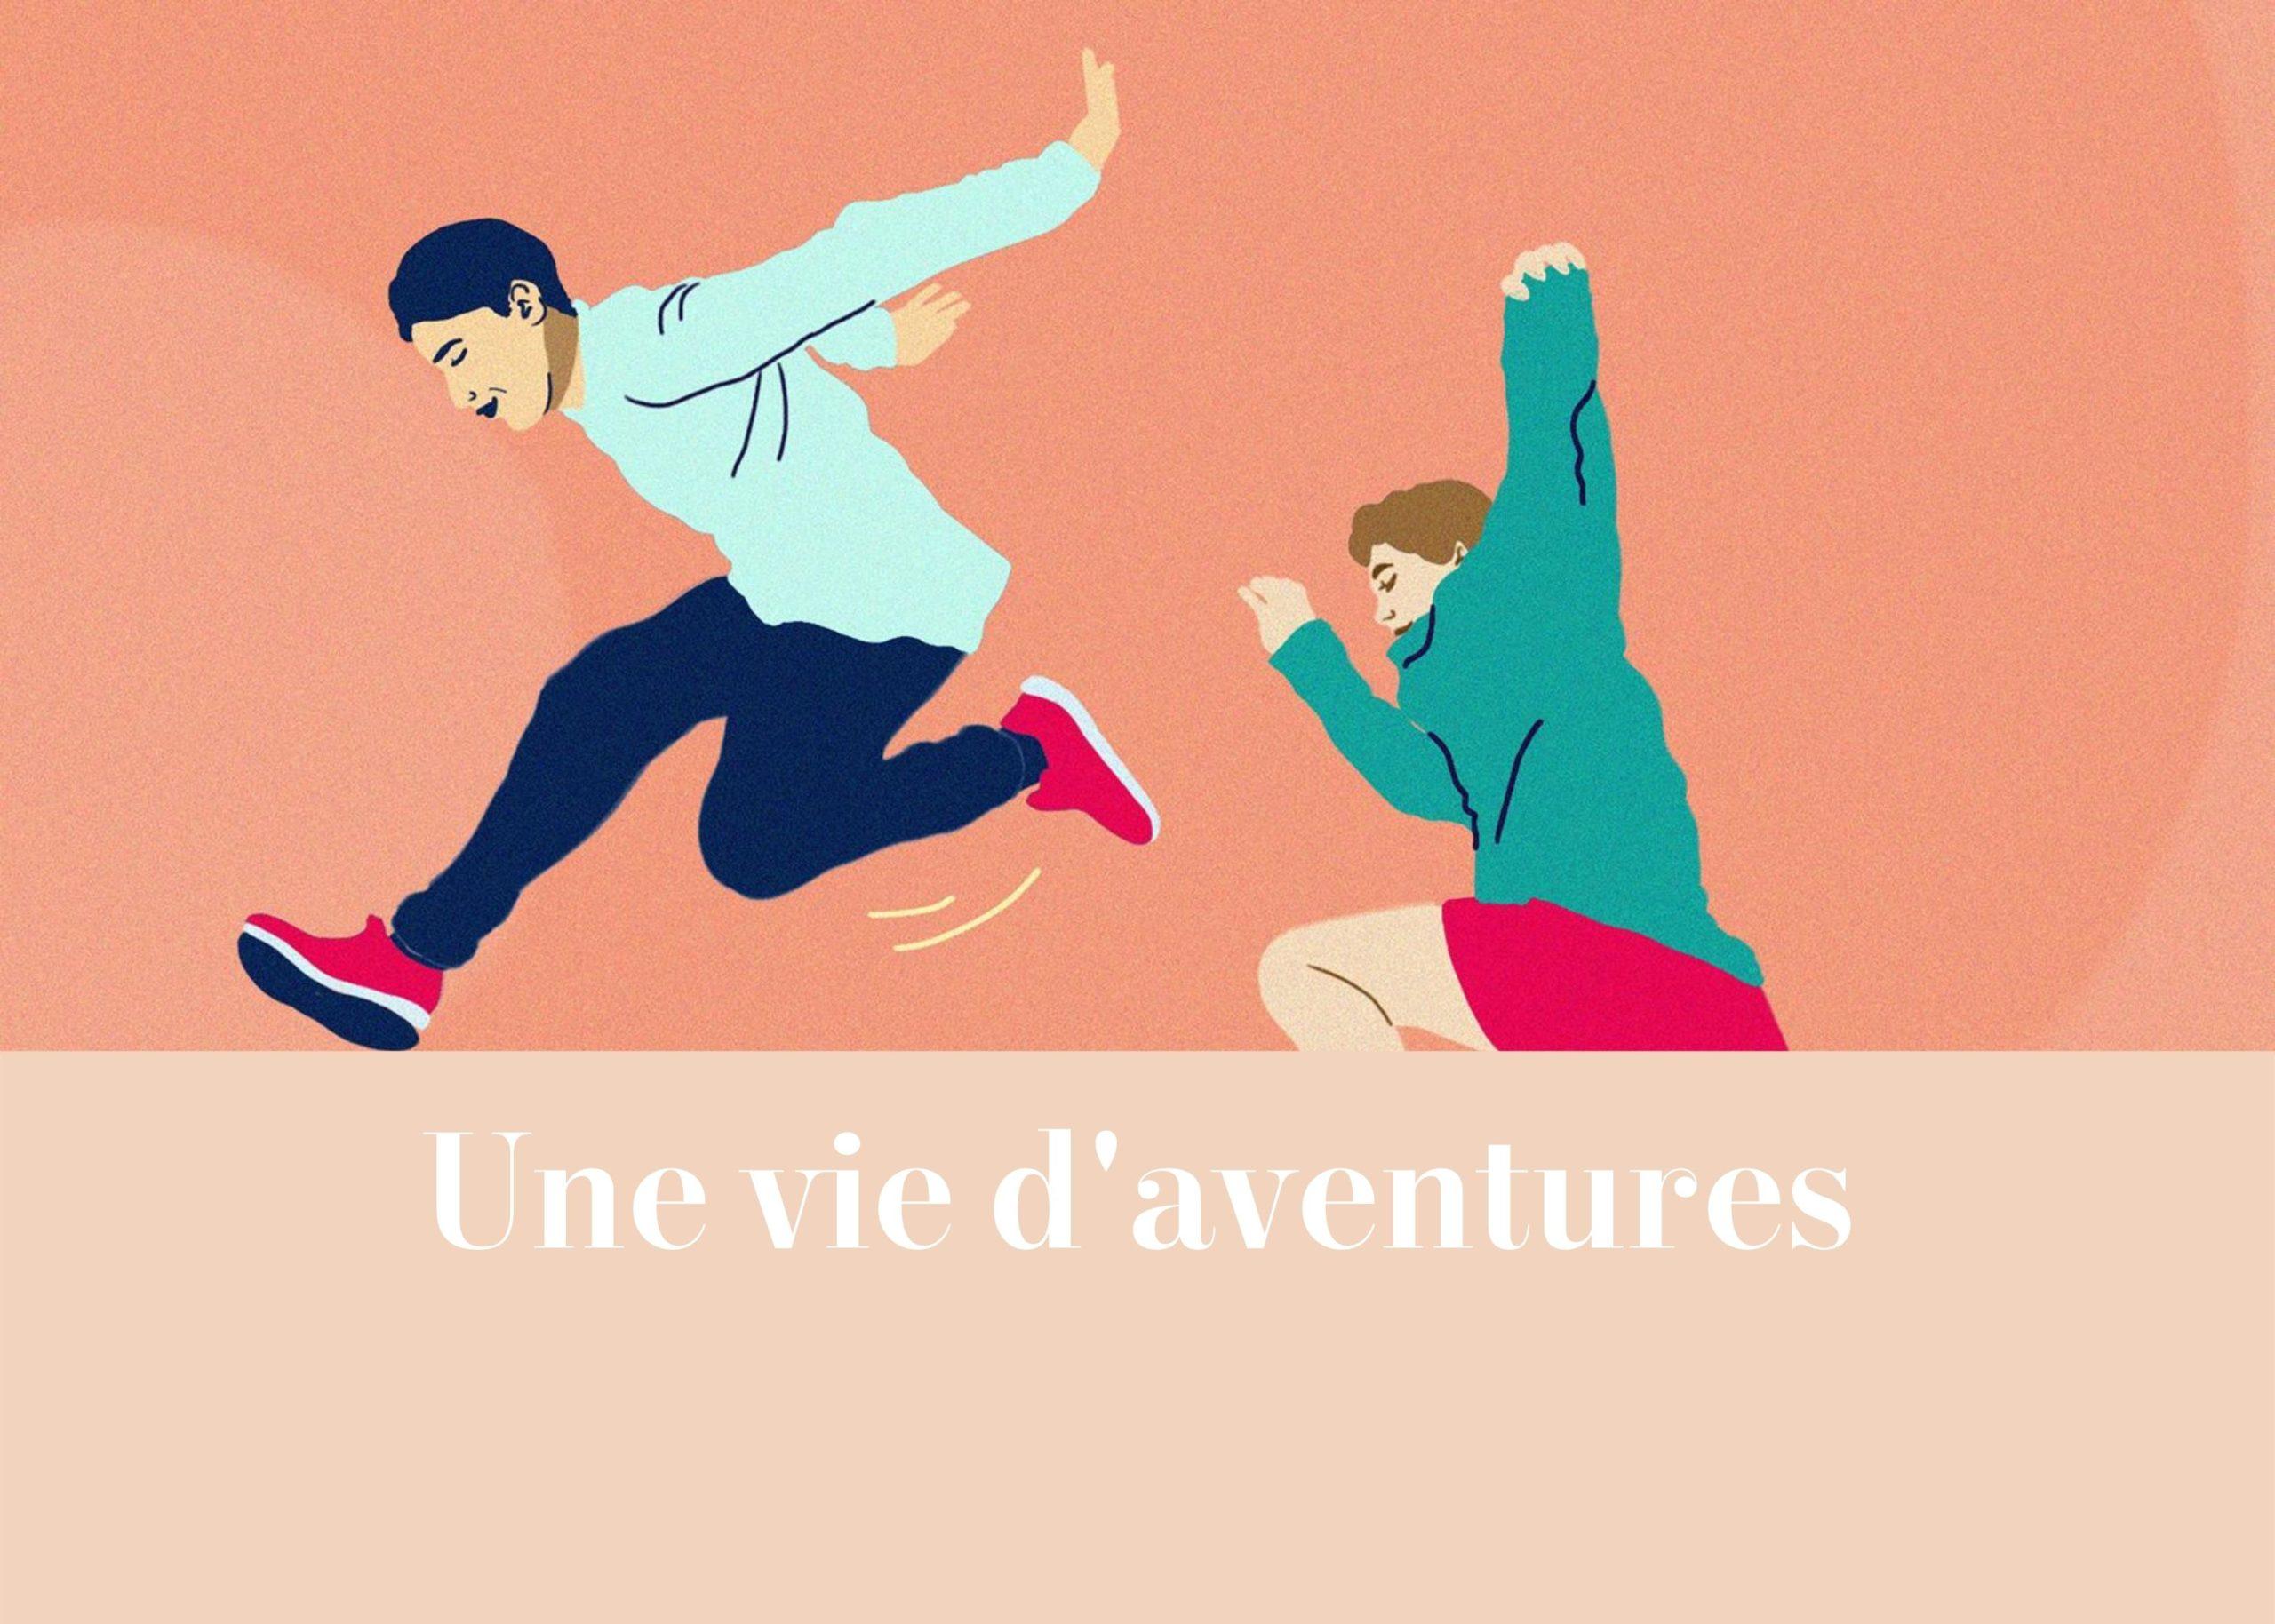 Une vie d'aventures